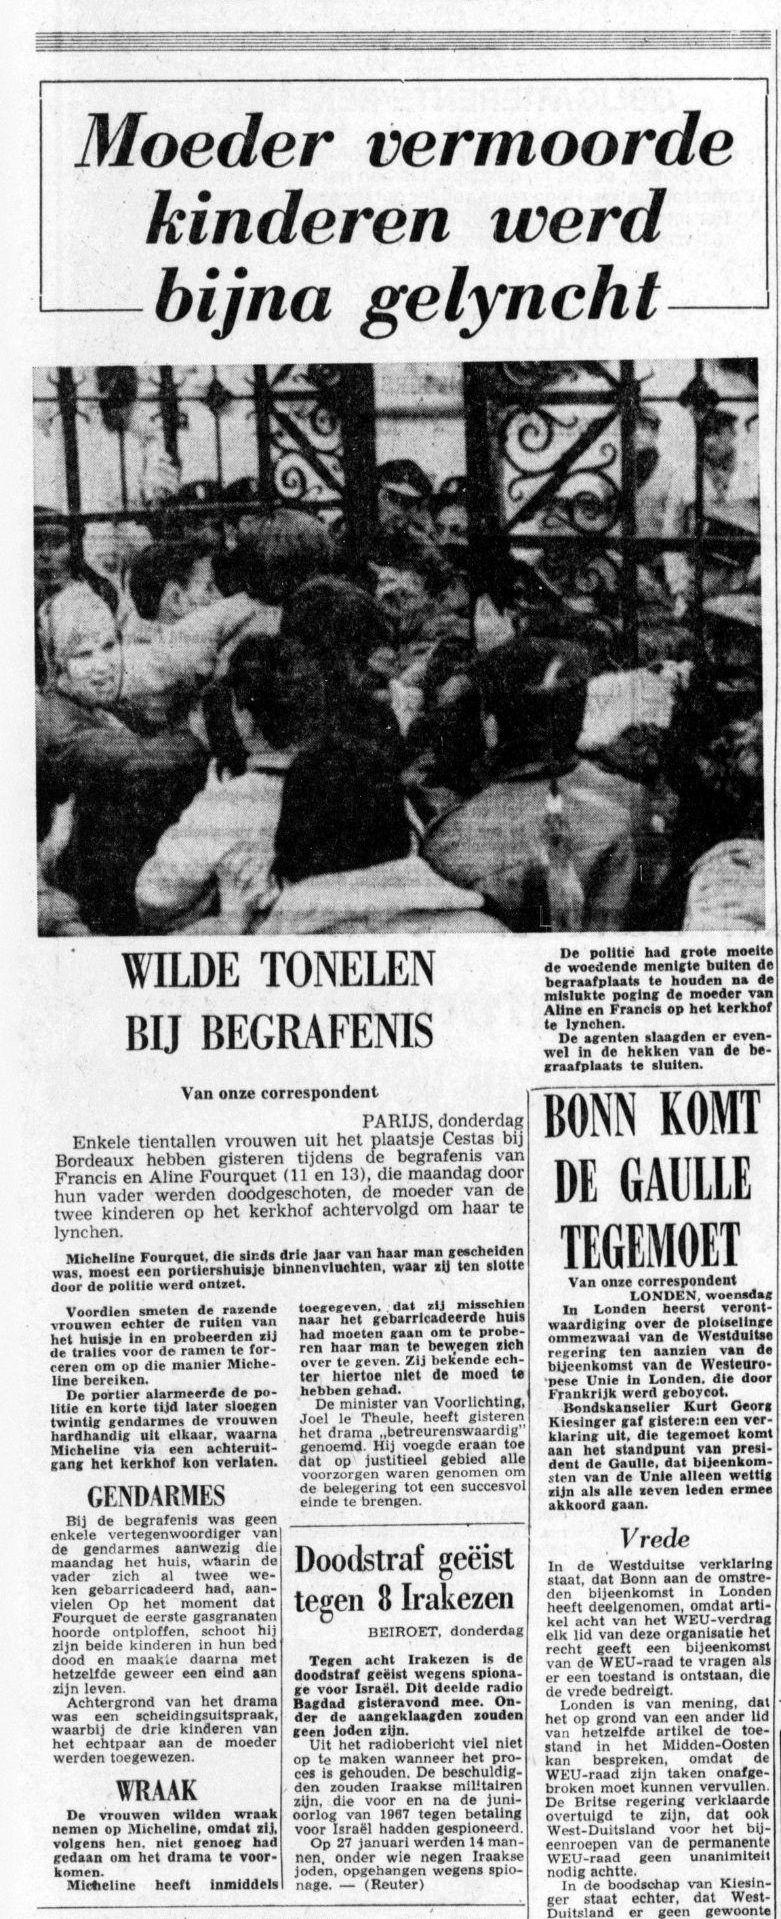 De Telegraaf, nº 25288, 20/02/1969, p. 9